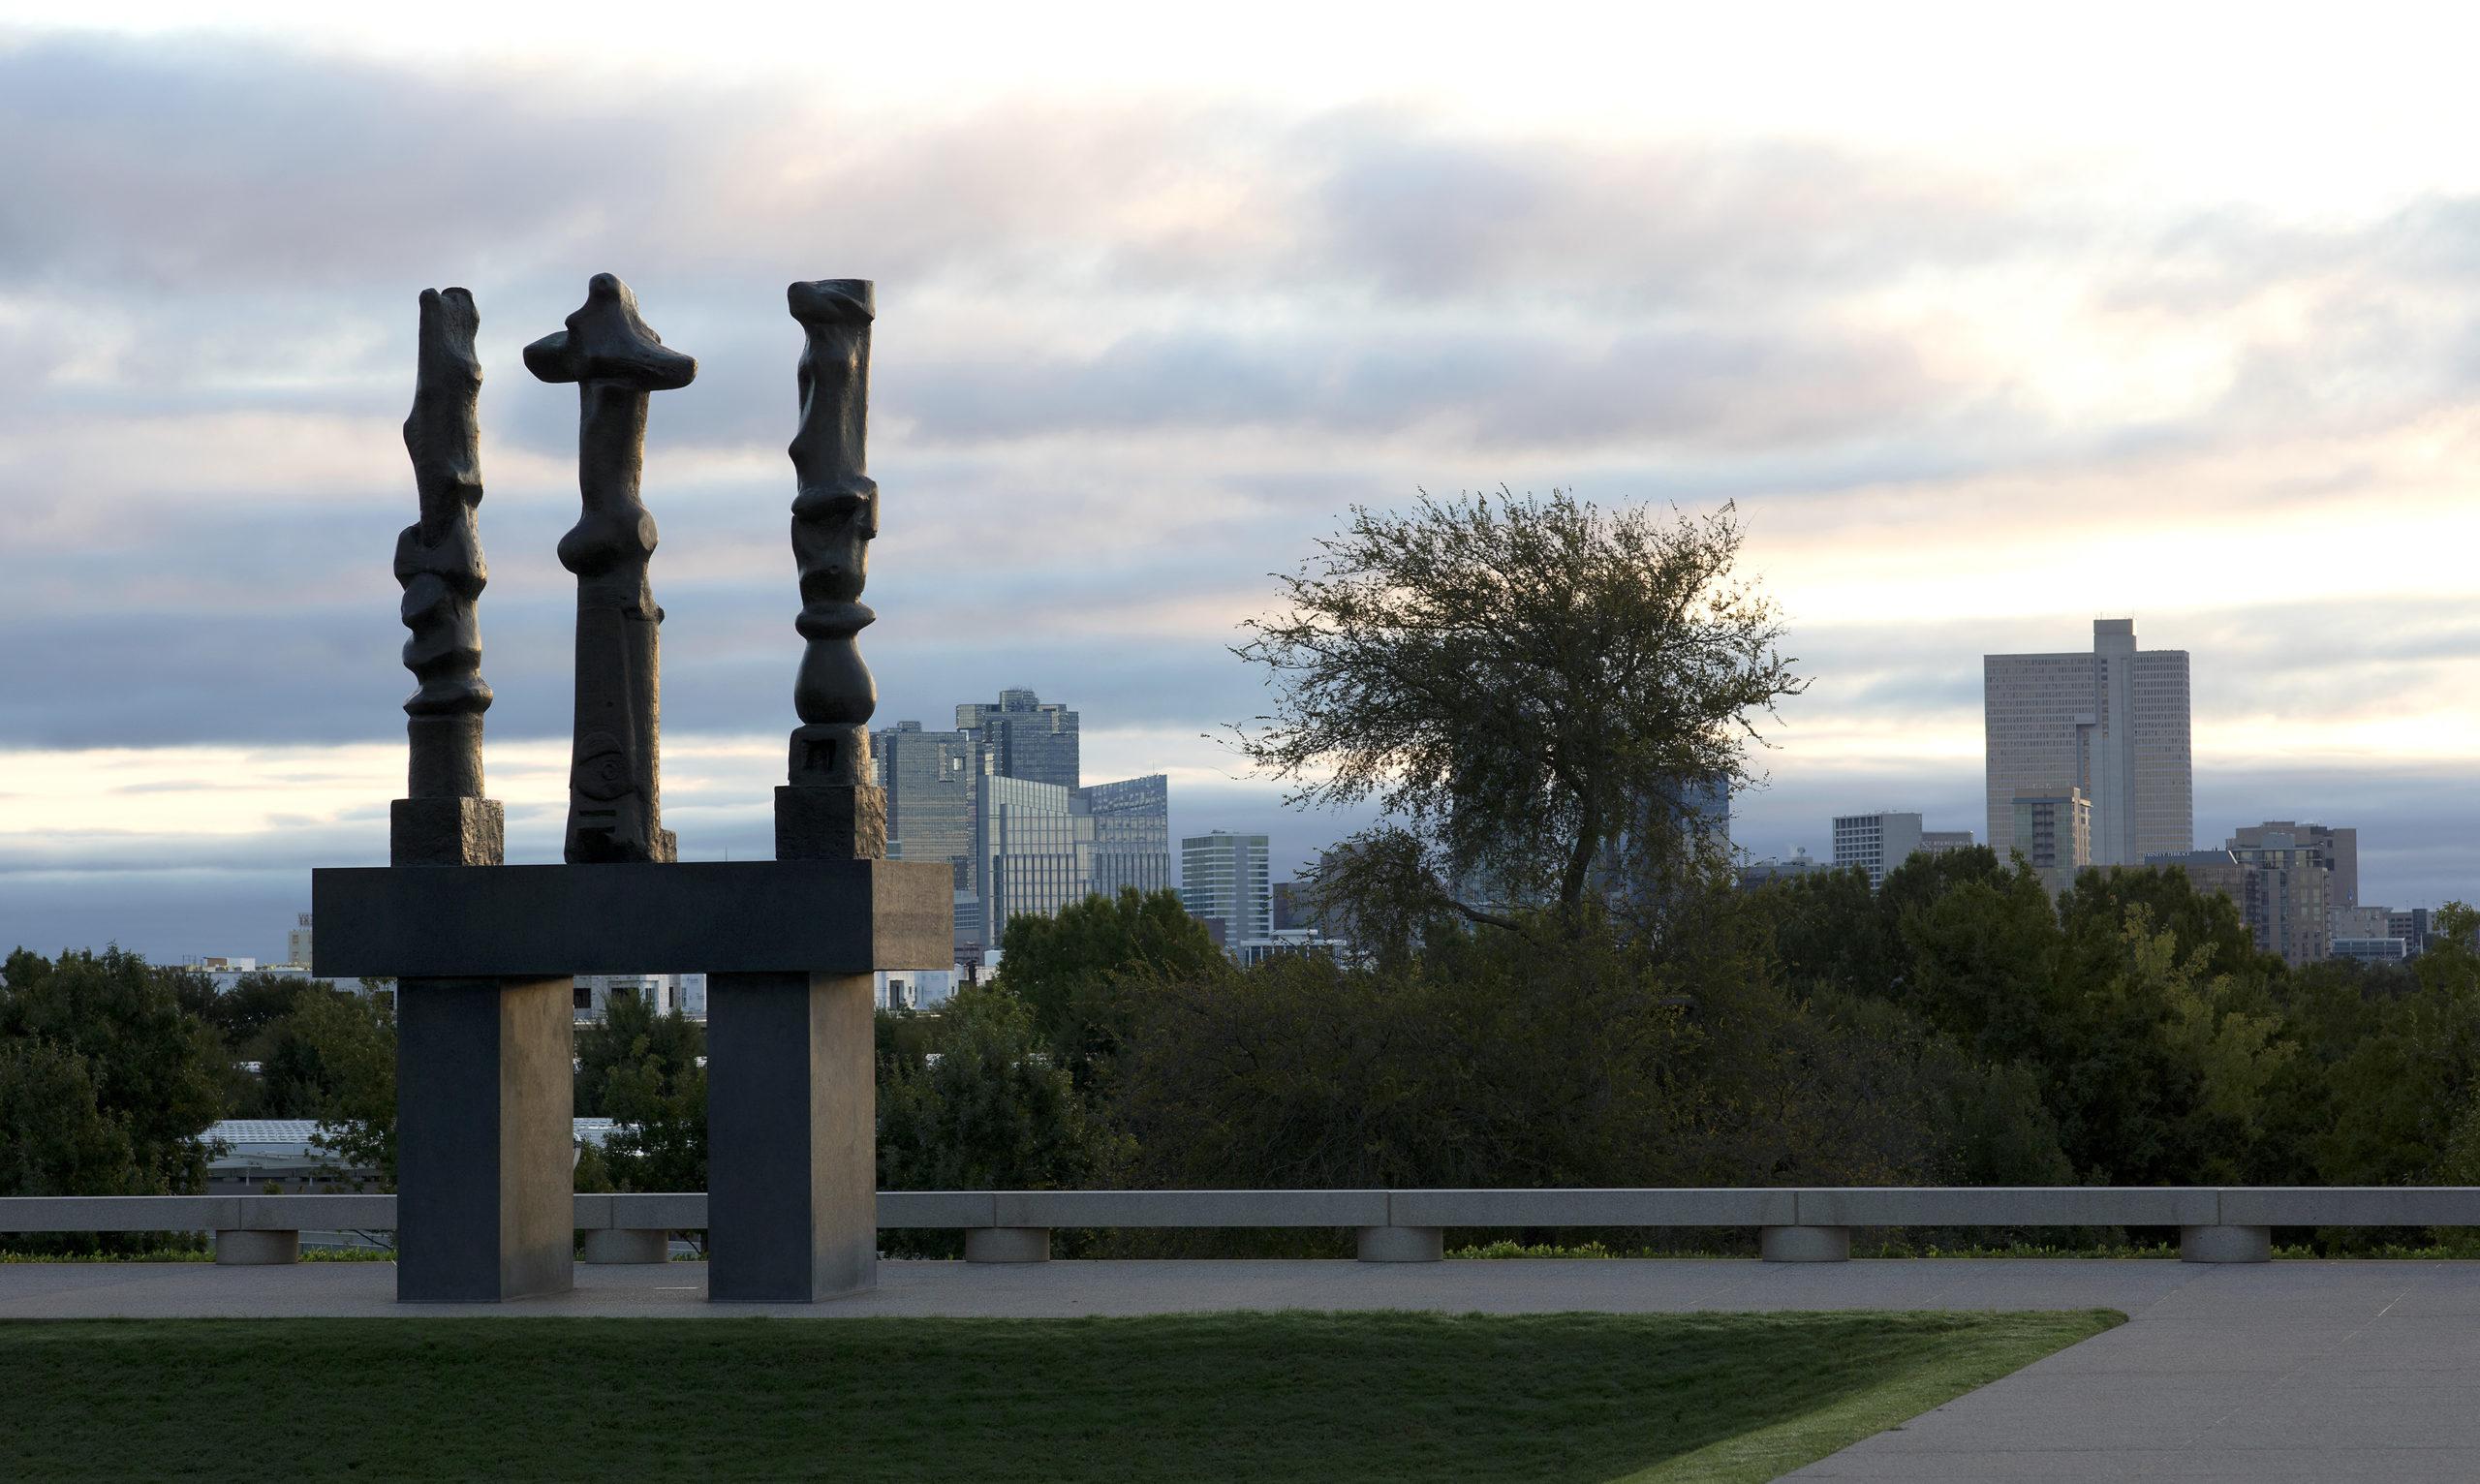 Amon Carter - Untitled sculpture